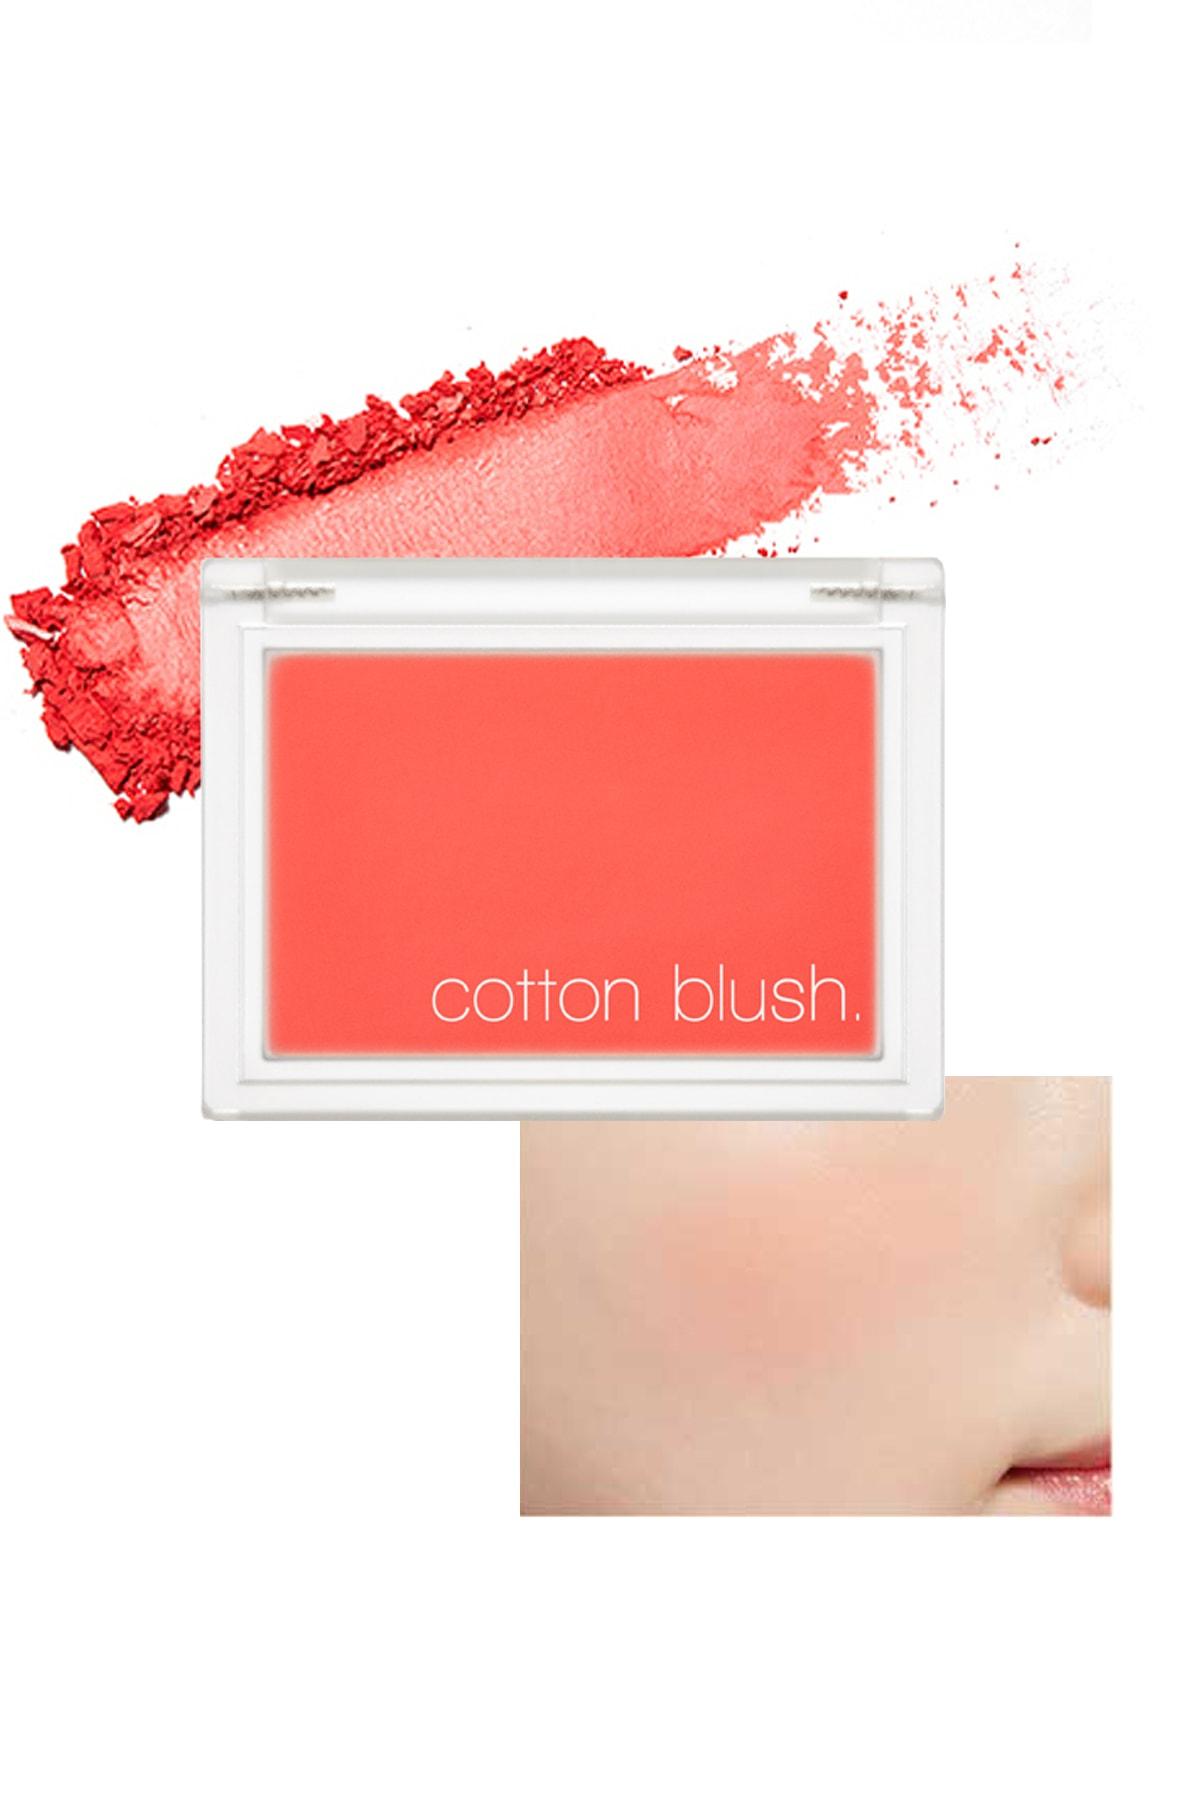 Missha Yumuşak Dokulu Kolay Sürülebilen Allık Cotton Blusher (Red Flat) 0